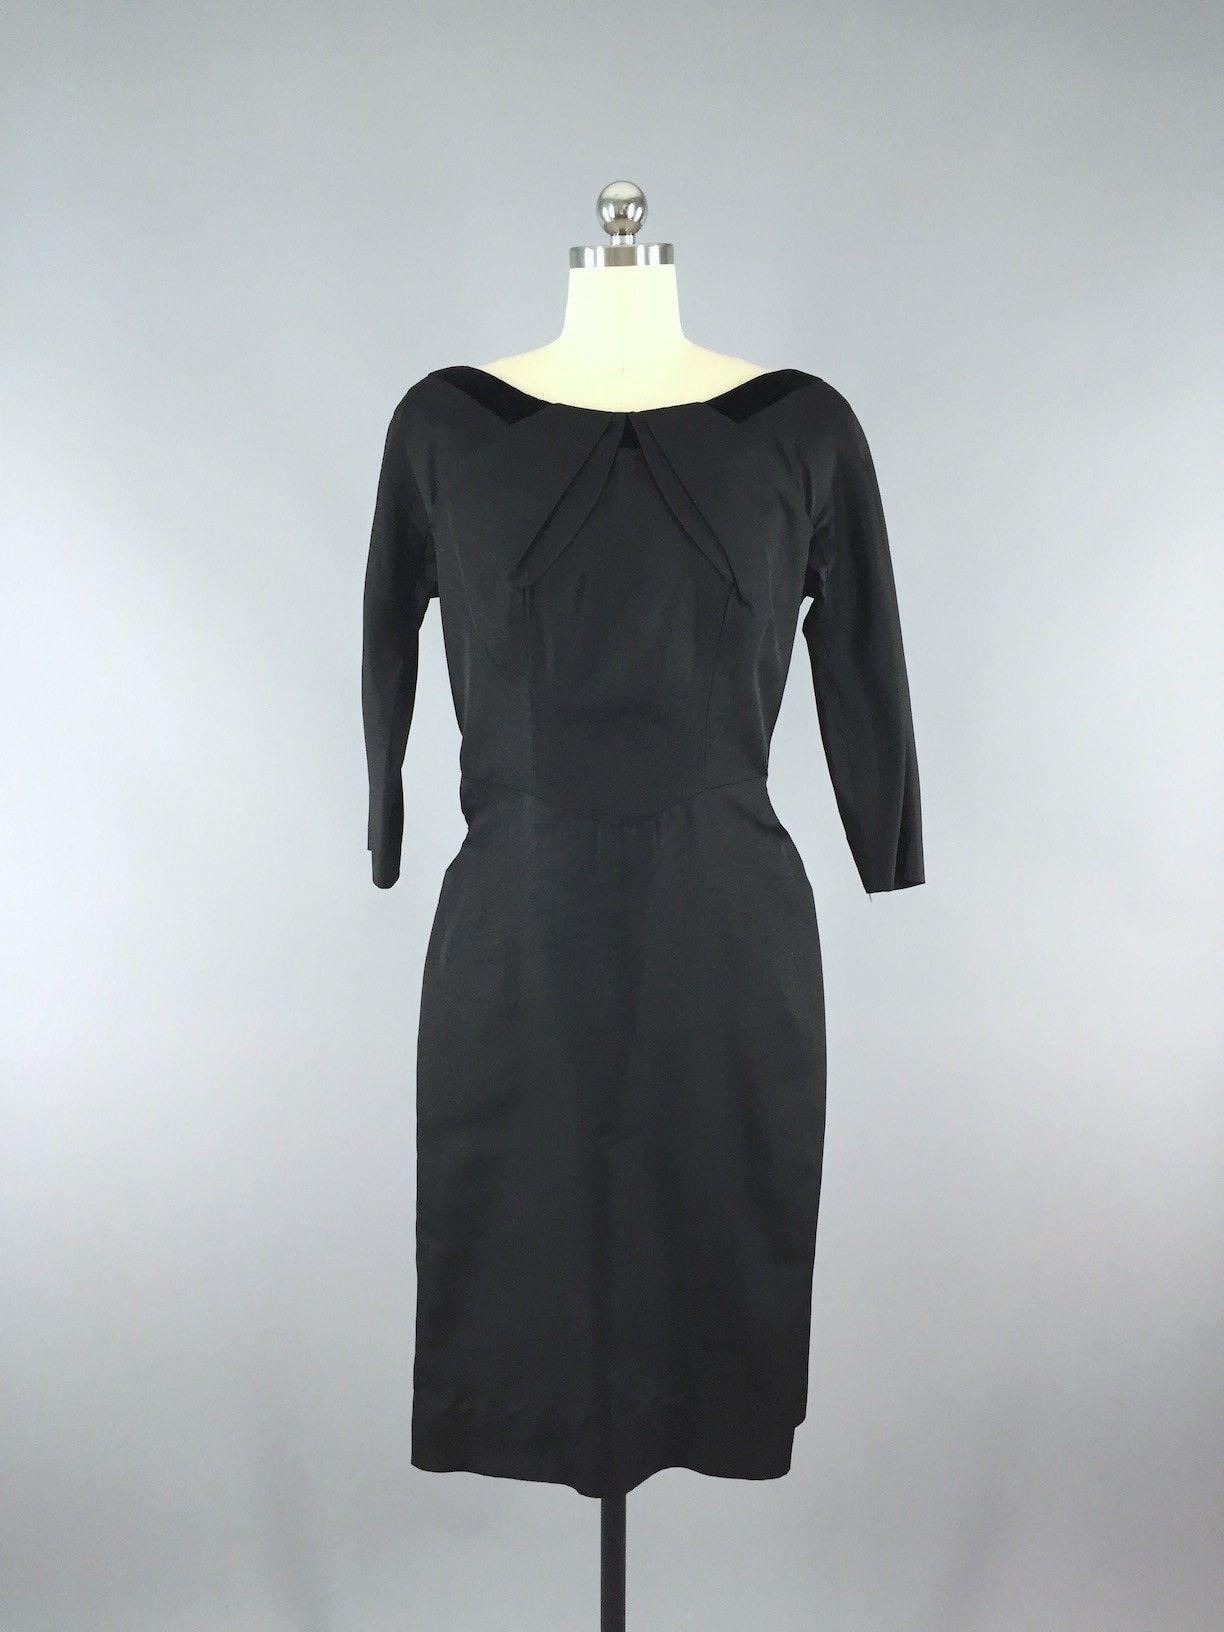 Vintage s black taffeta new look dress products